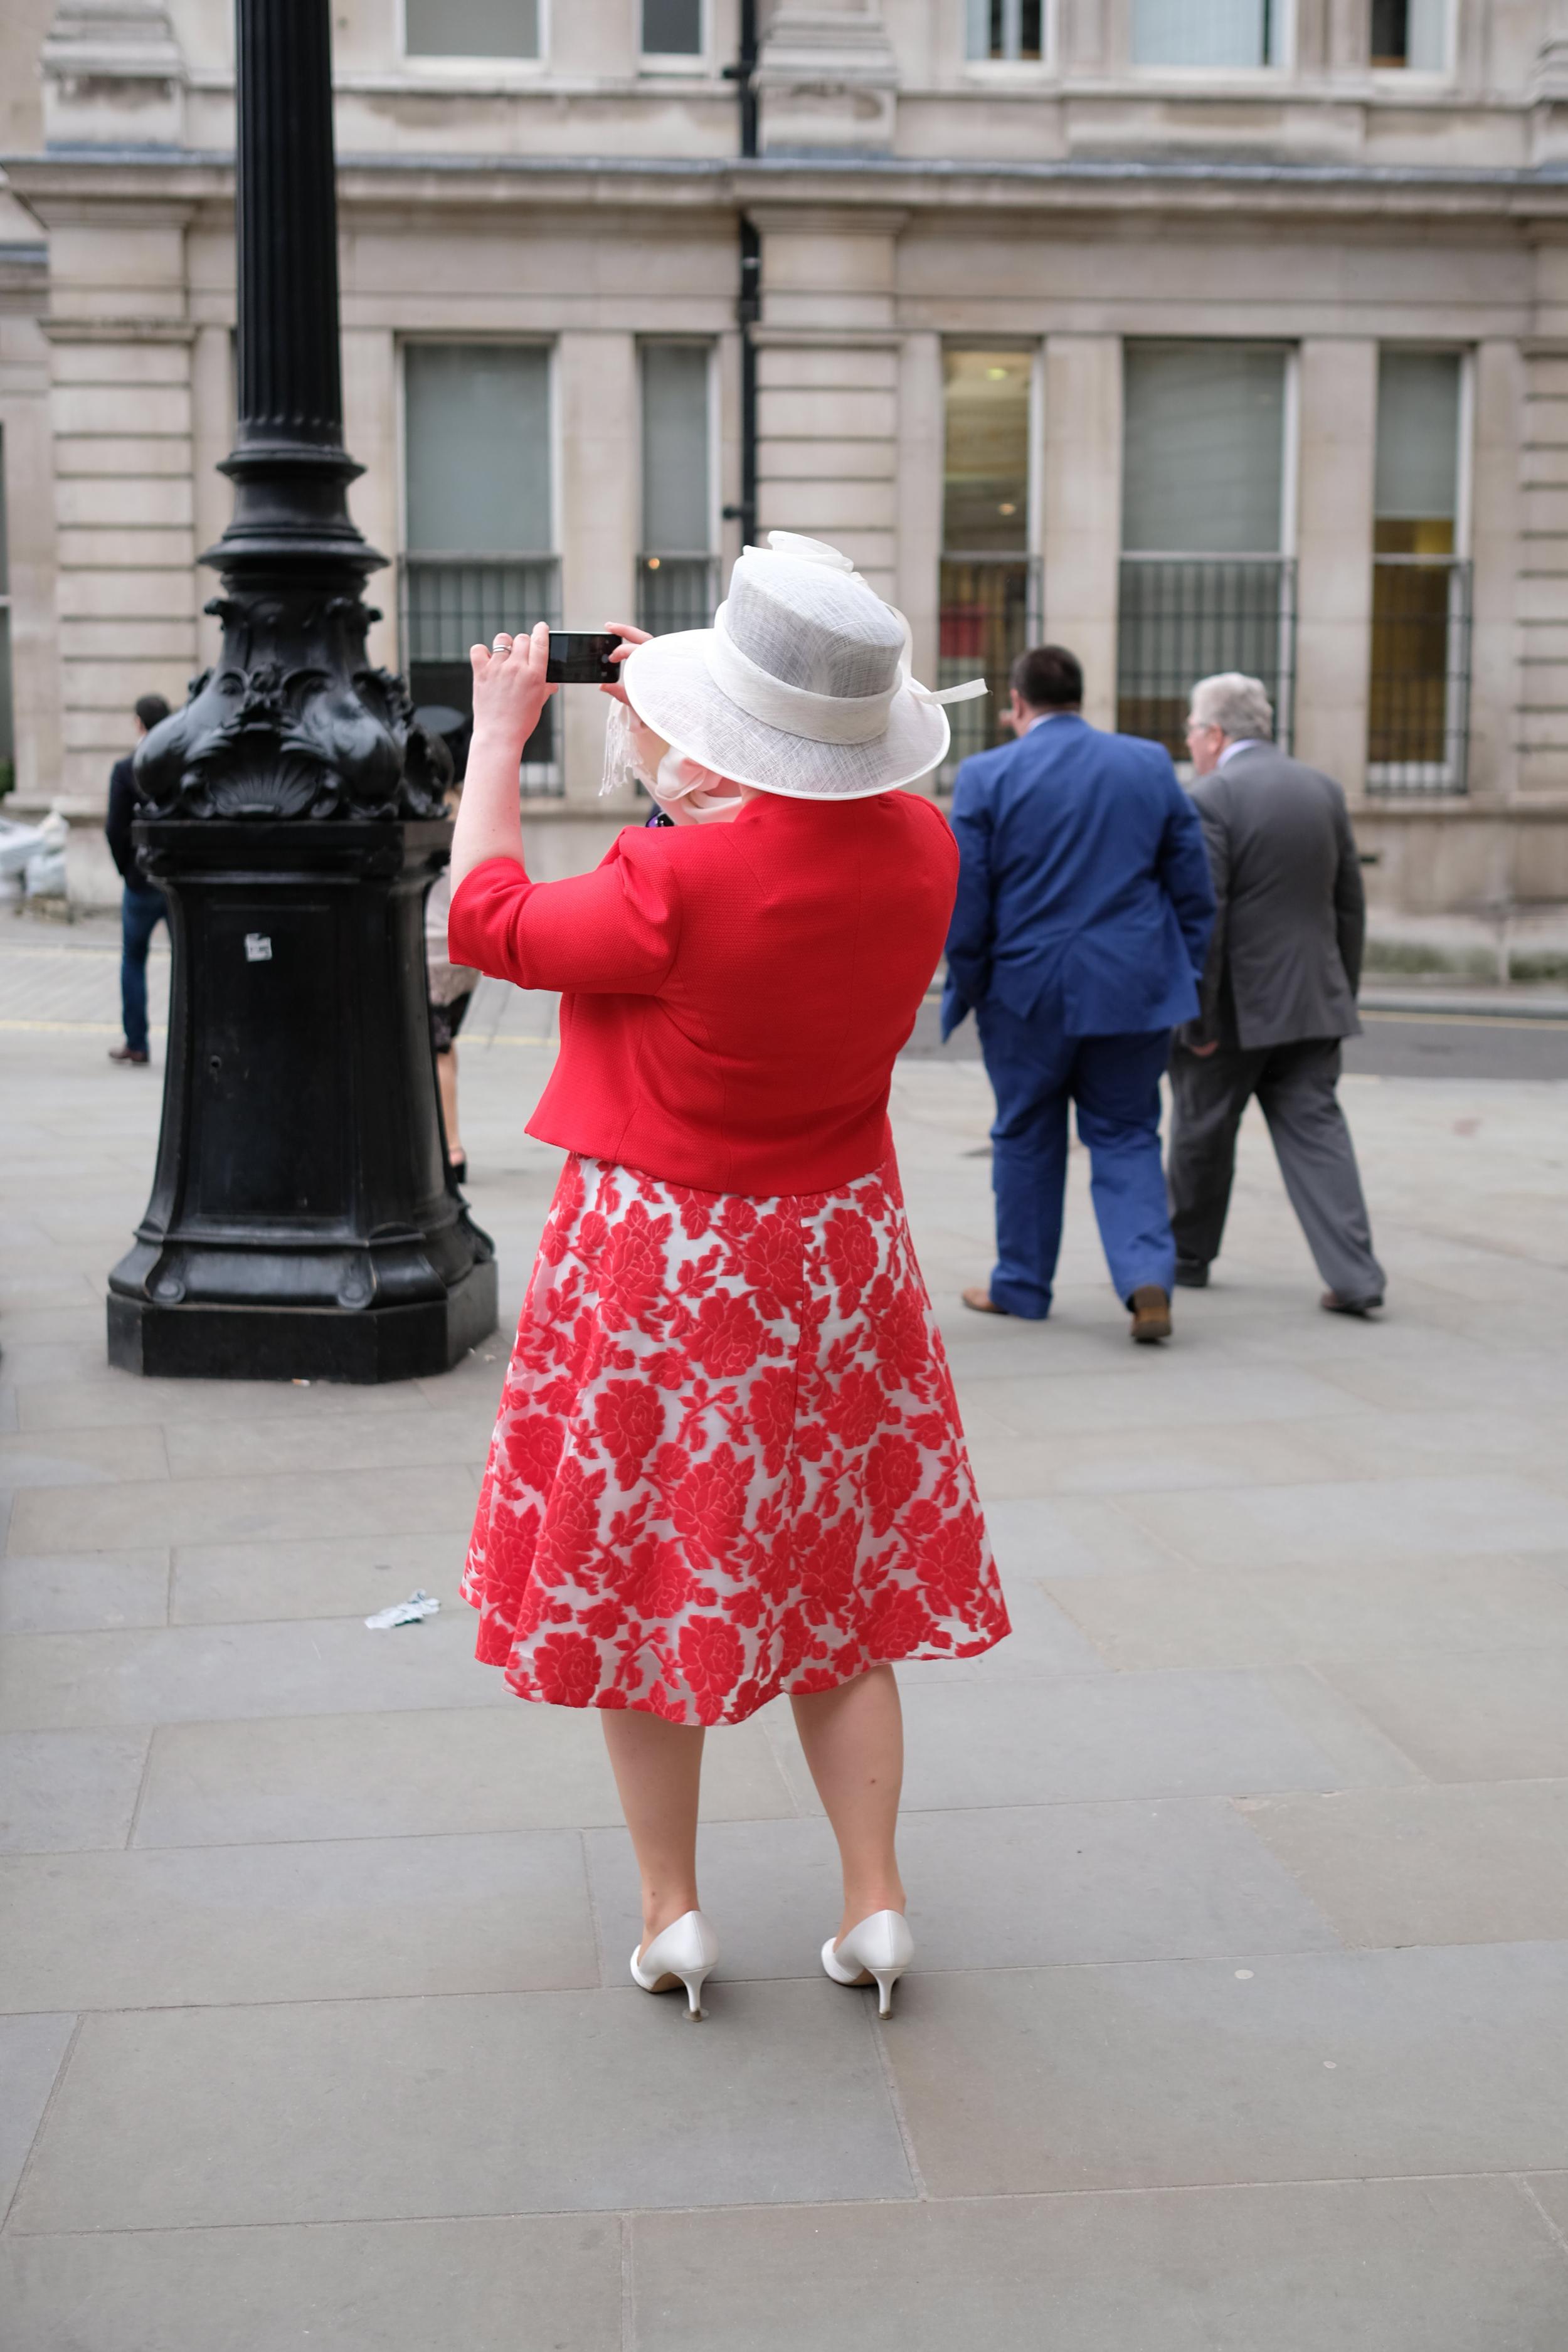 MUSEE_PHOTO_LONDON_2016-2062-2.jpg